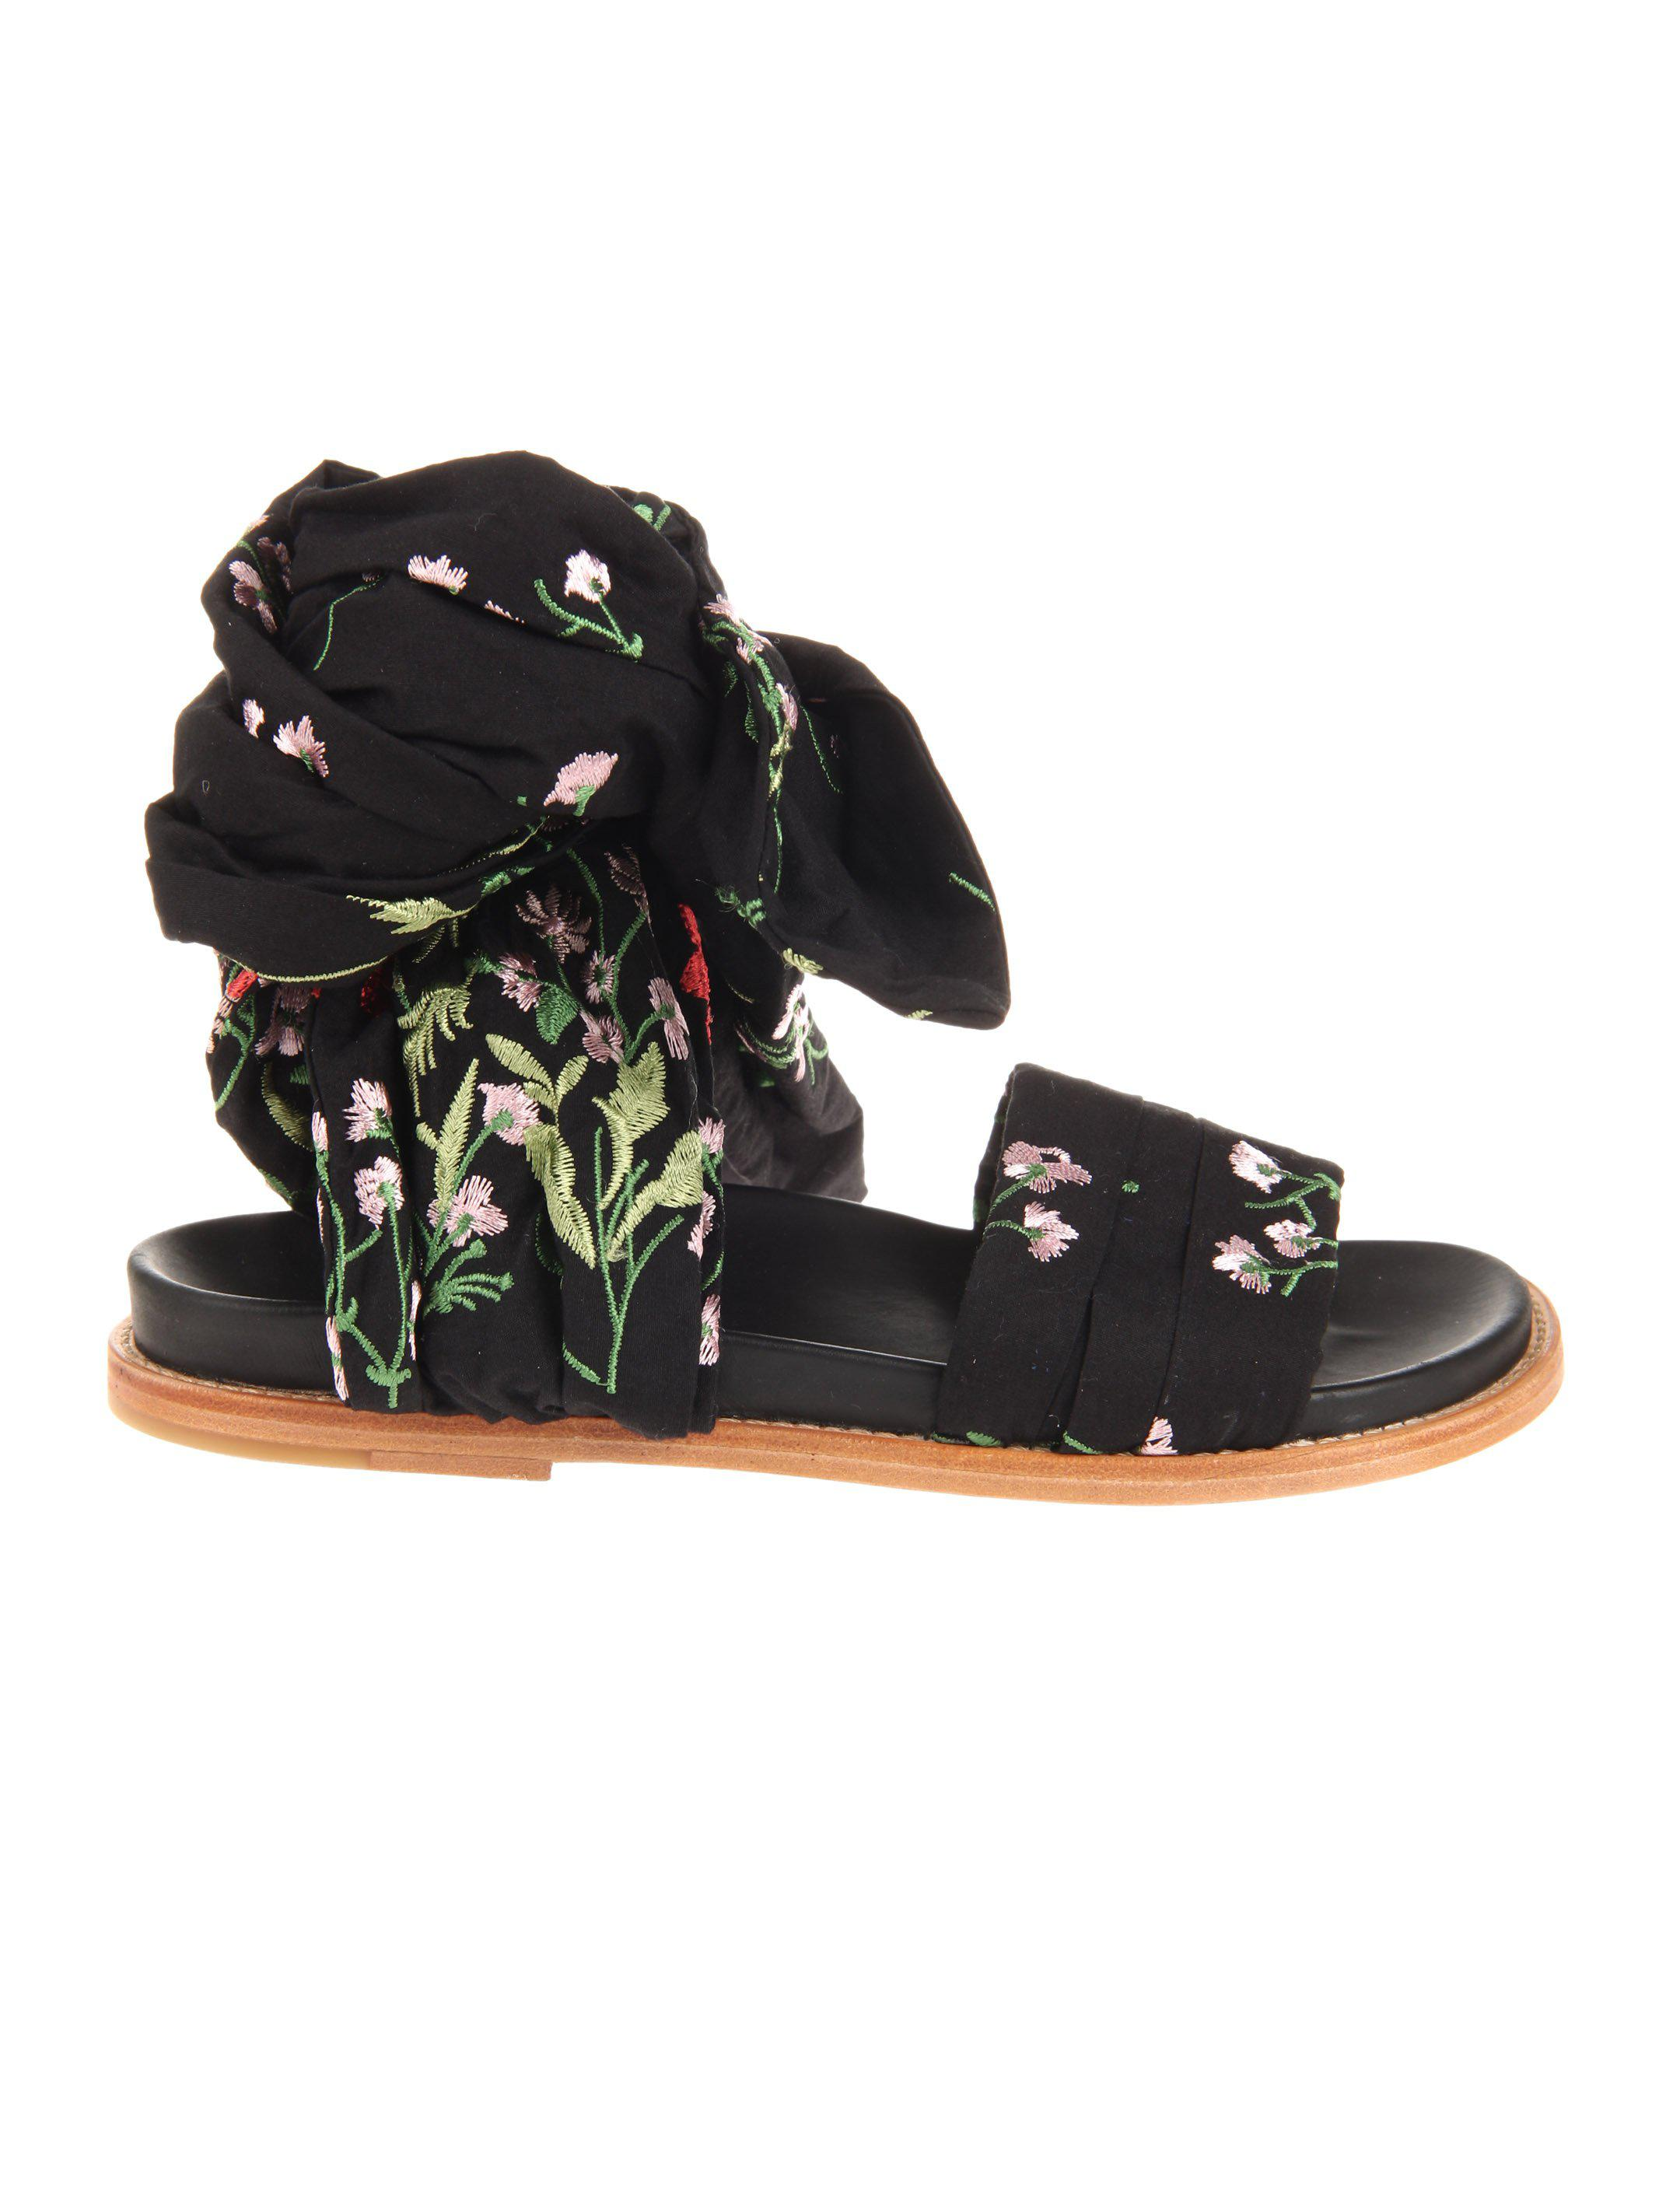 MARQUES'ALMEIDA Floral embroidered wrap sandals JAaUa